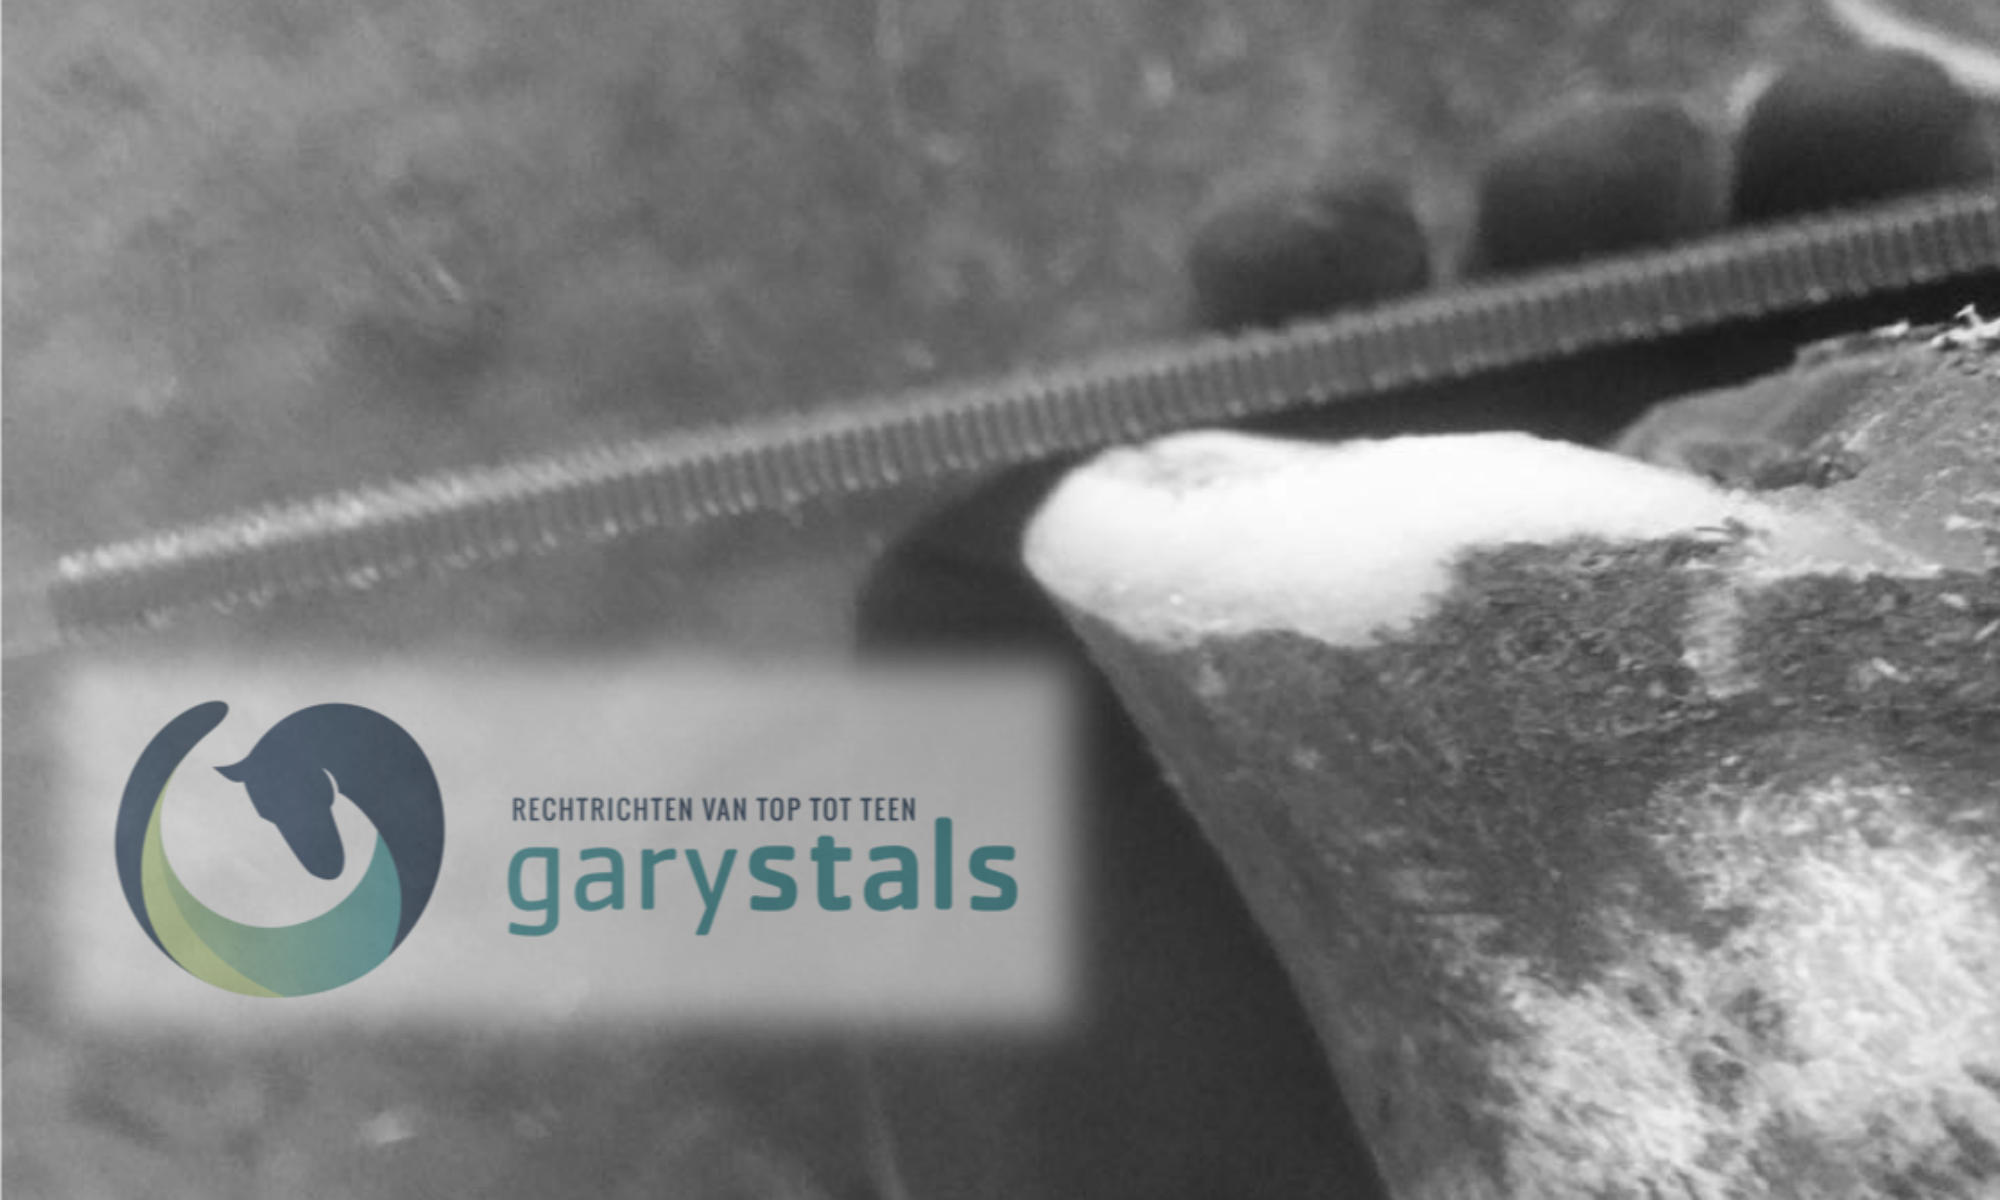 Gary Stals